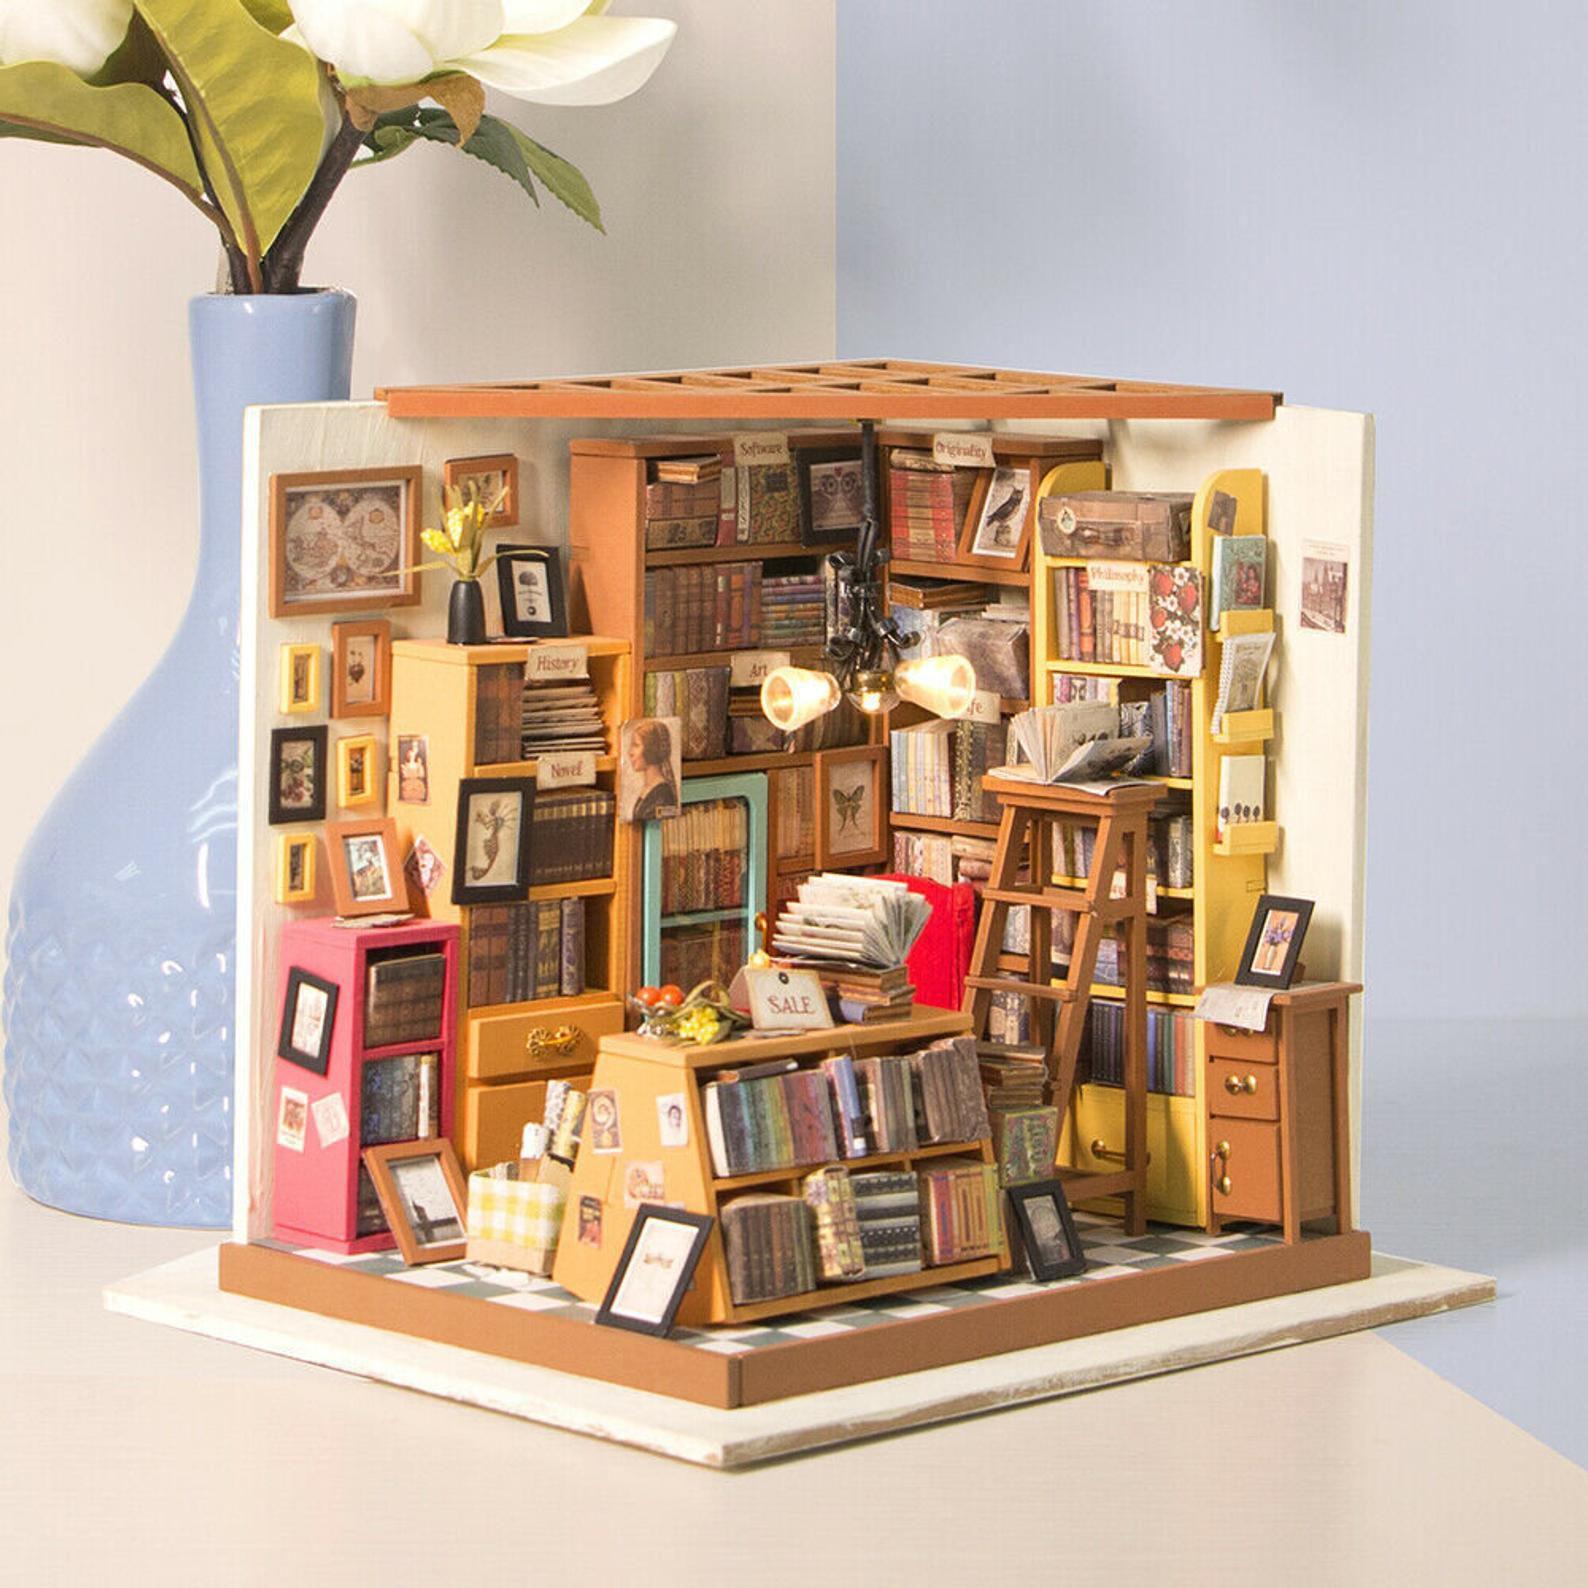 Bookstore diorama